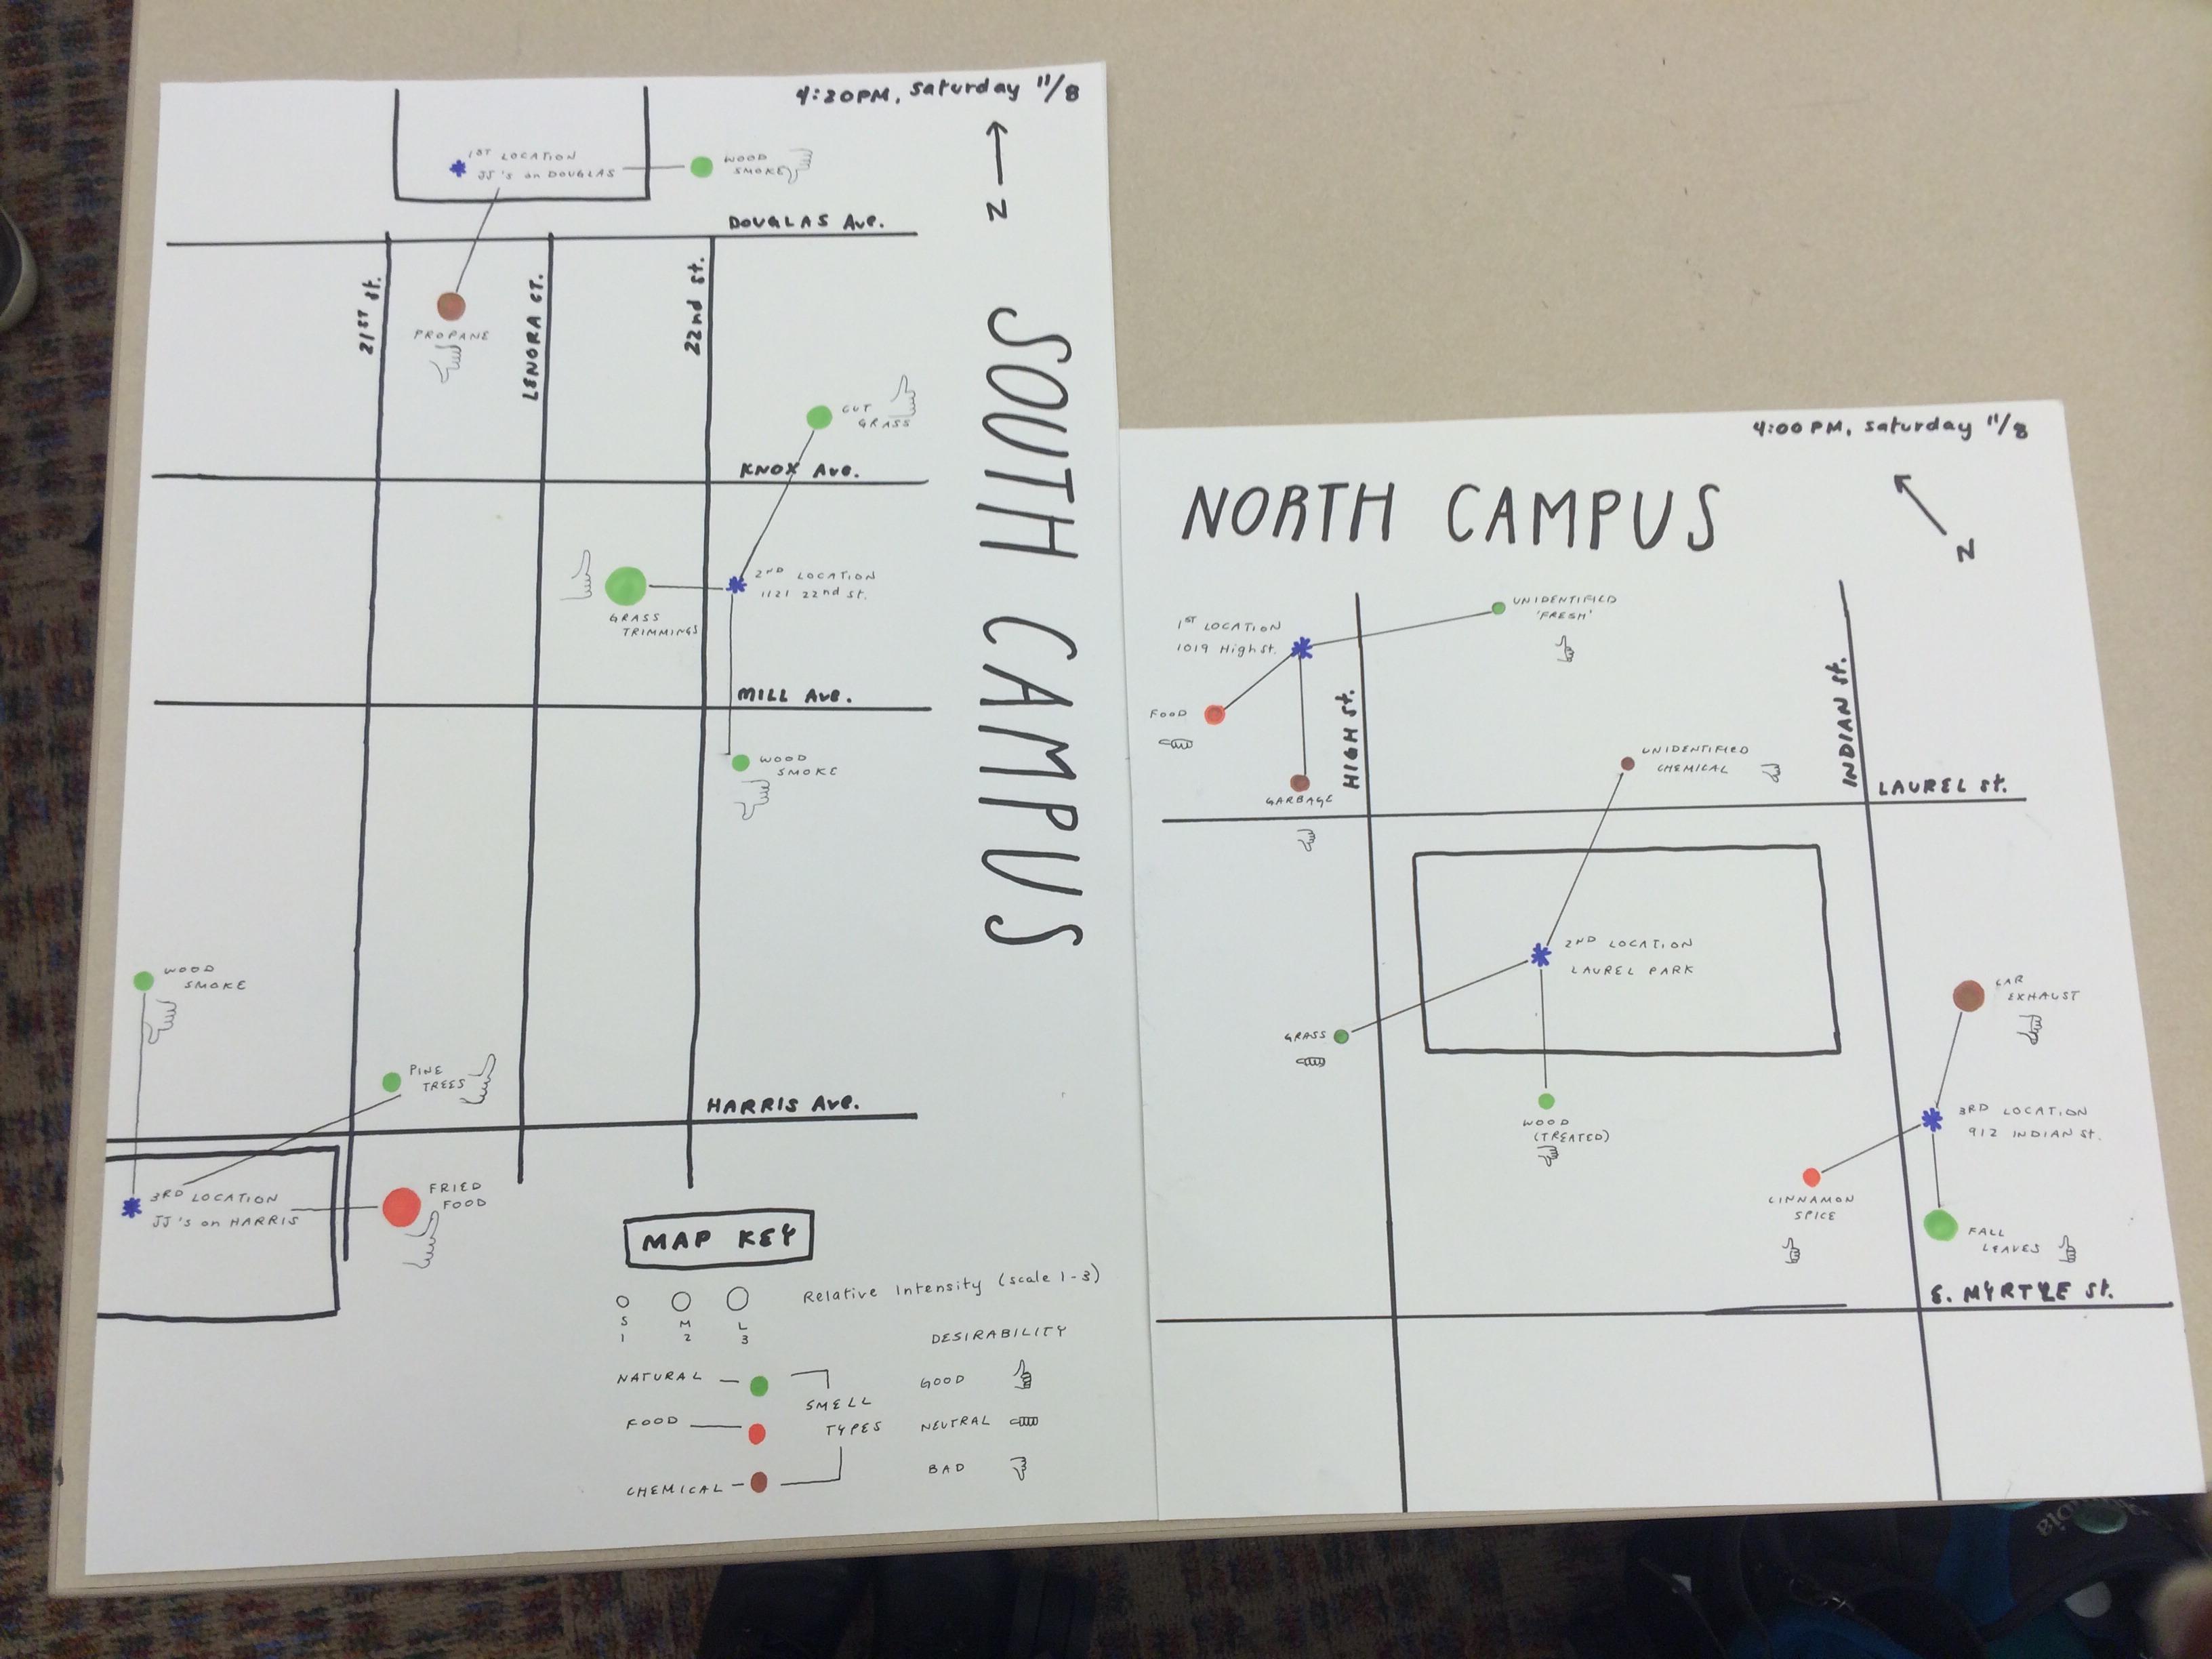 Sensory Map of WWU campus